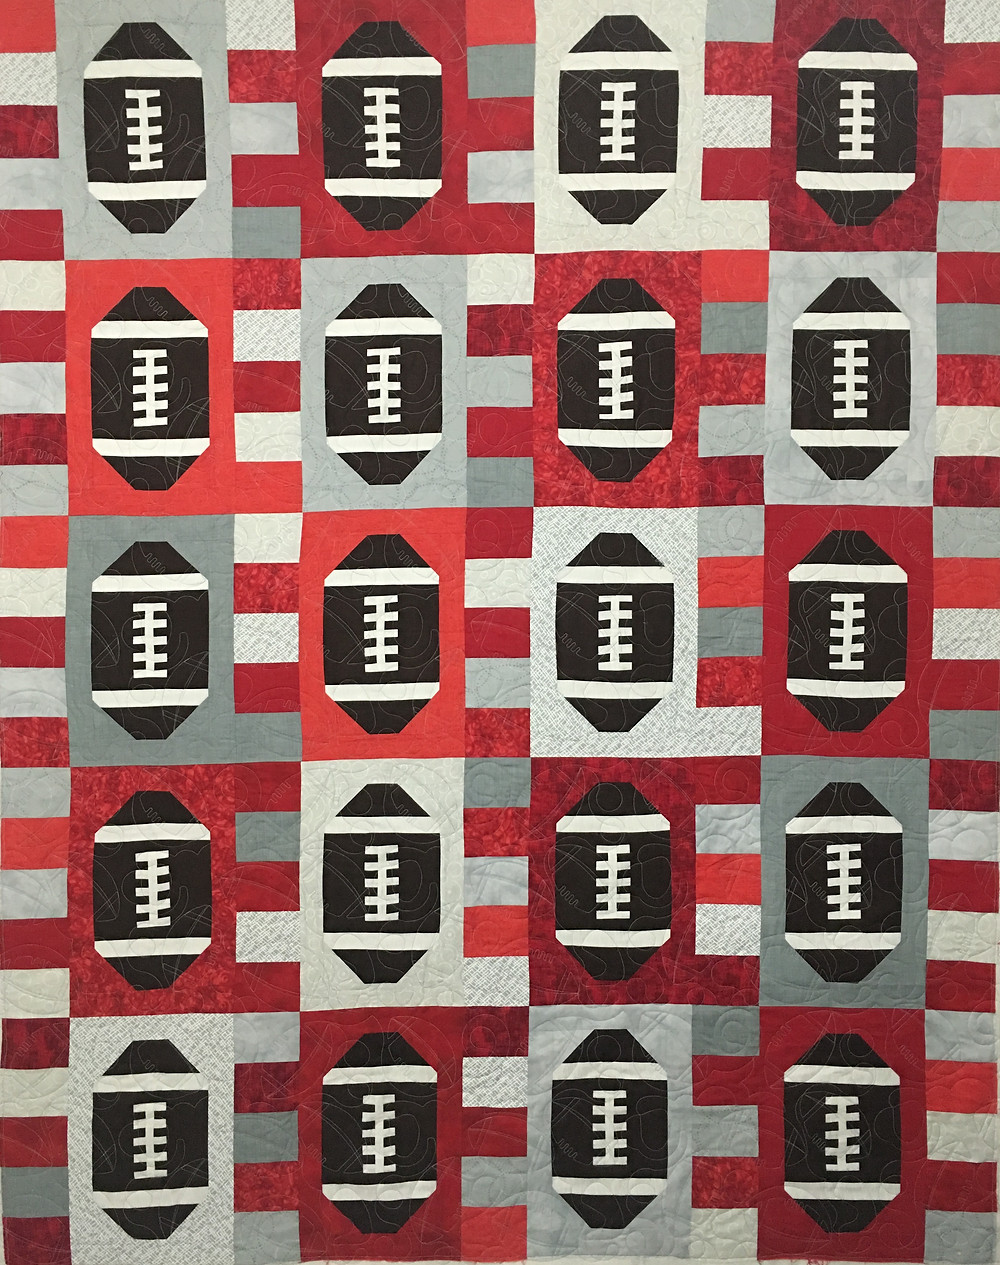 Touchdown Football Quilt by Joan Salesman